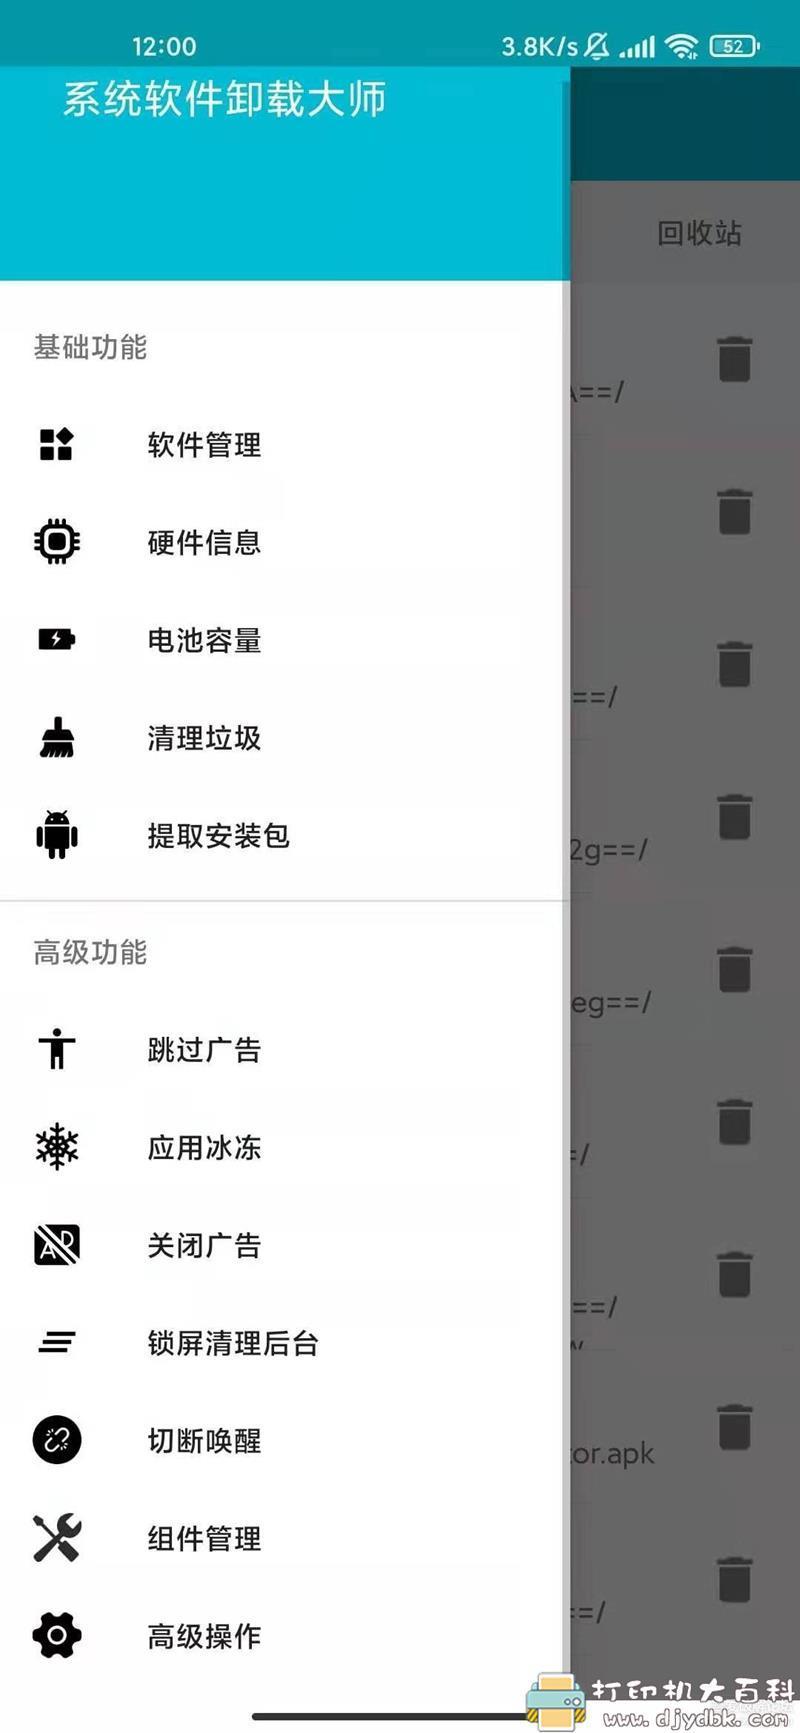 [Android]系统软件卸载大师 v2.5.5.0 去广告解锁高级版 配图 No.3